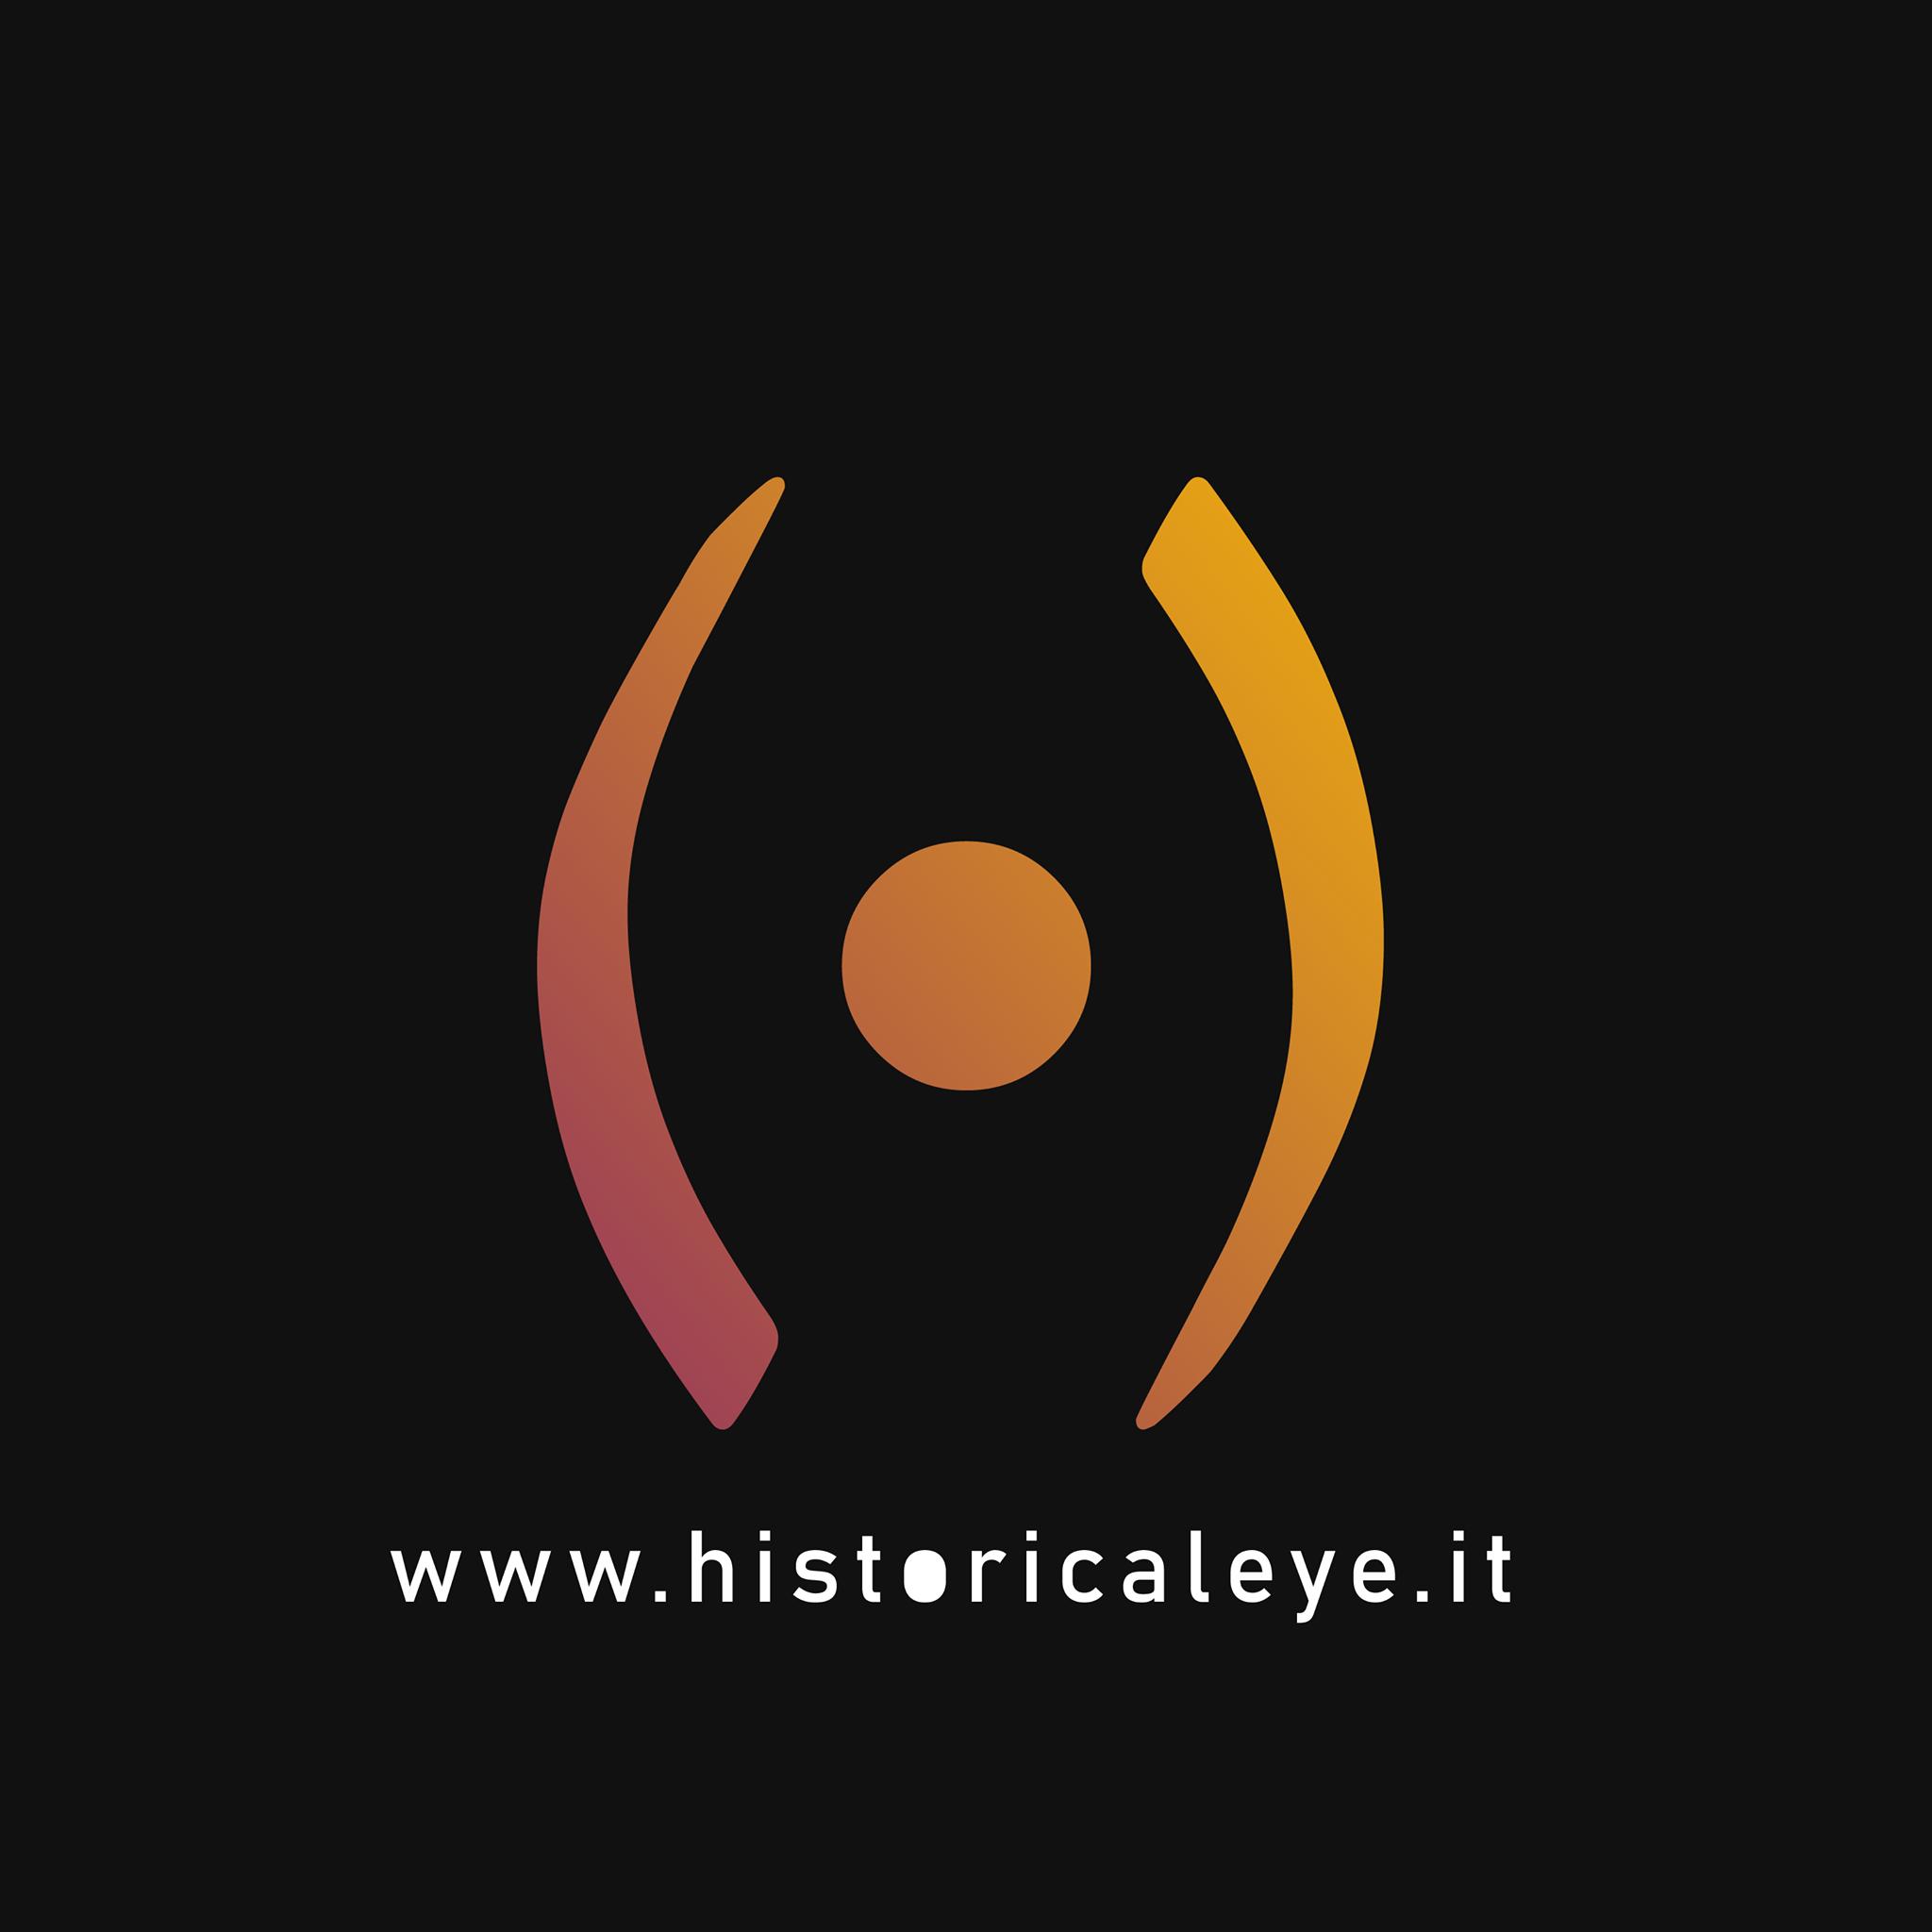 HISTORICALEYE +